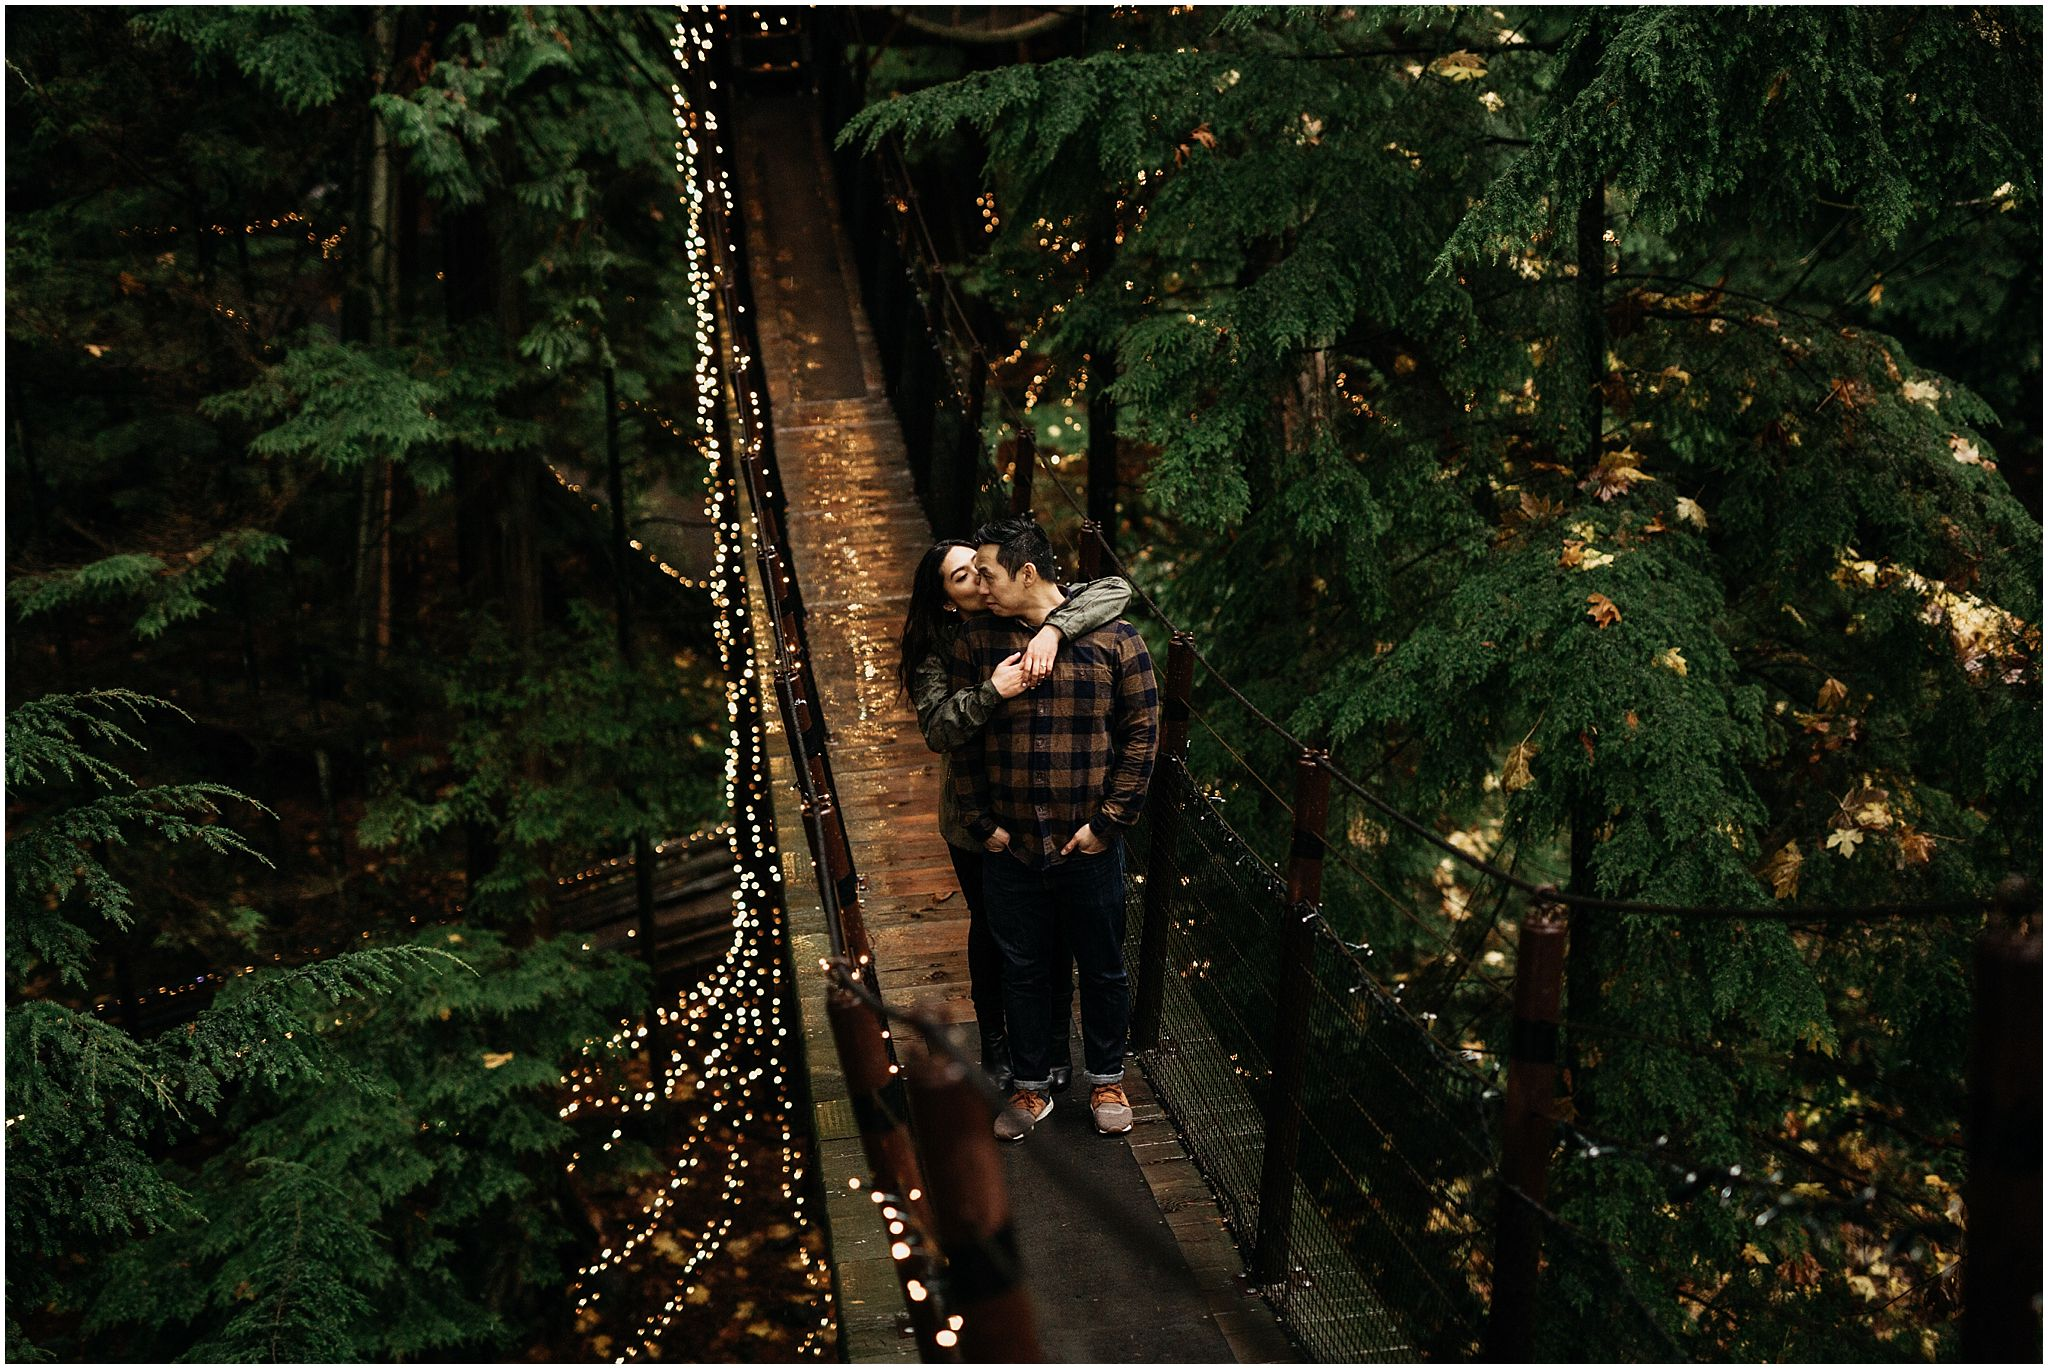 capilano suspension bridge canyon lights engagement photos couple hugging